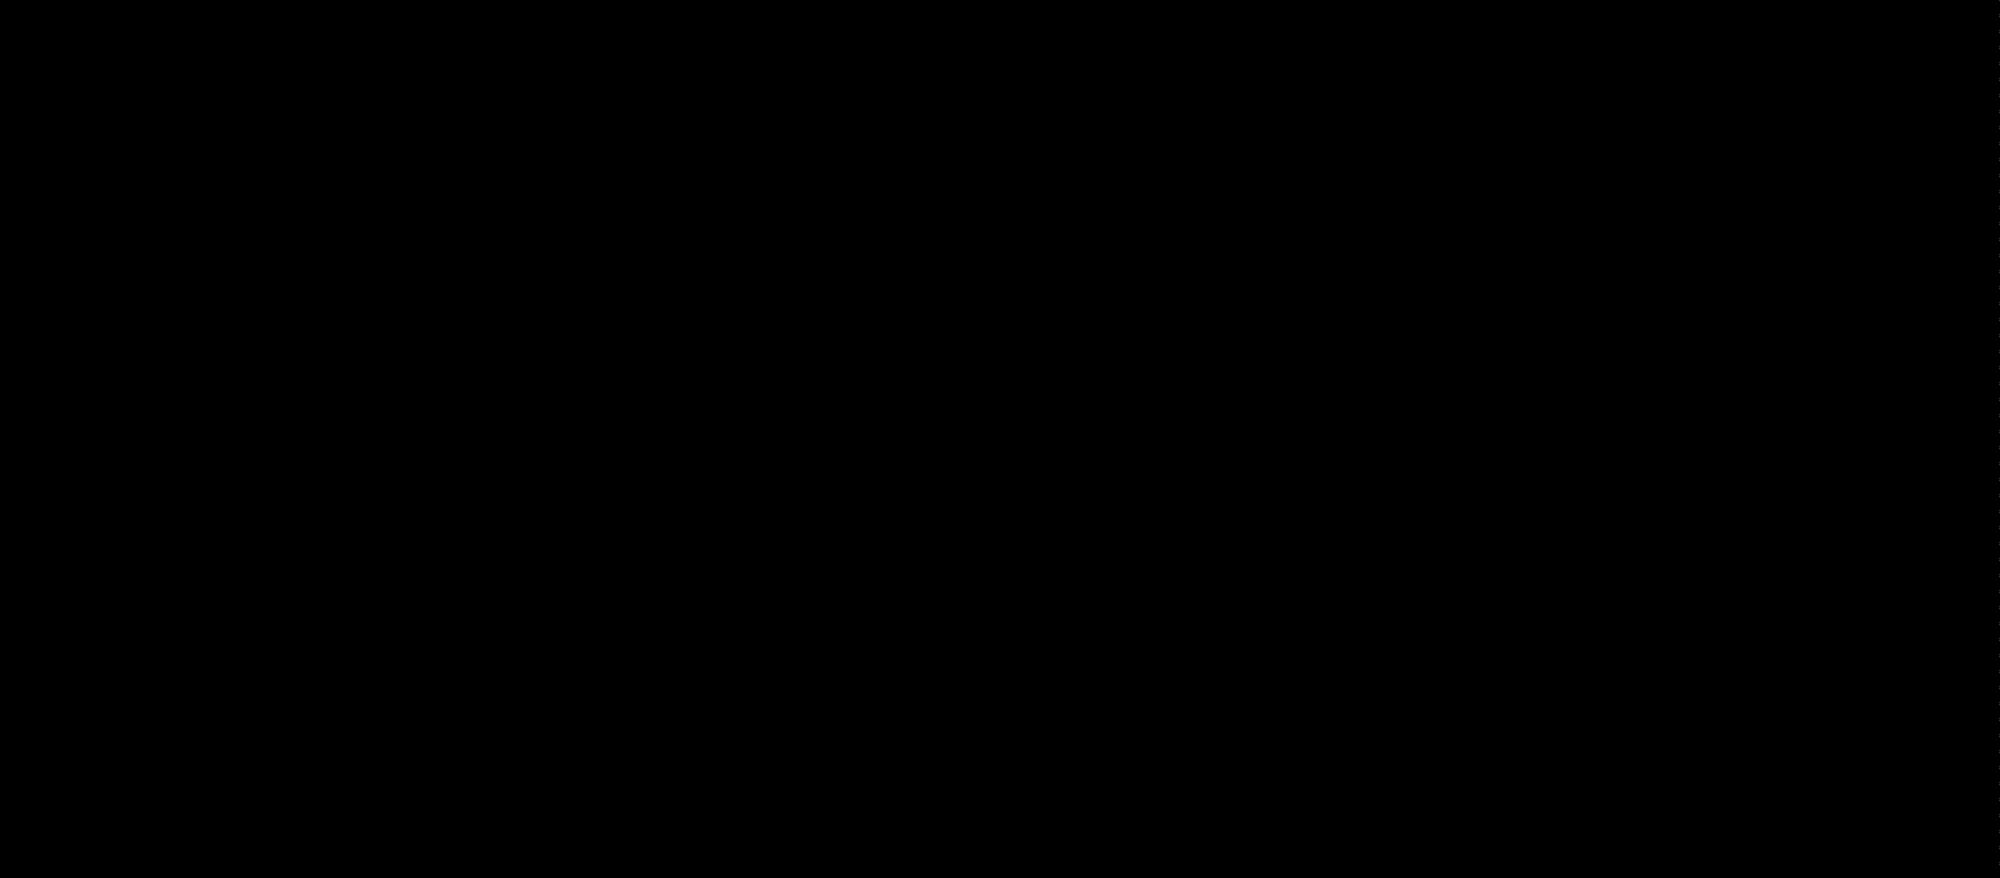 Forevermark永恒印记品牌代言人秦岚的爱情宣言